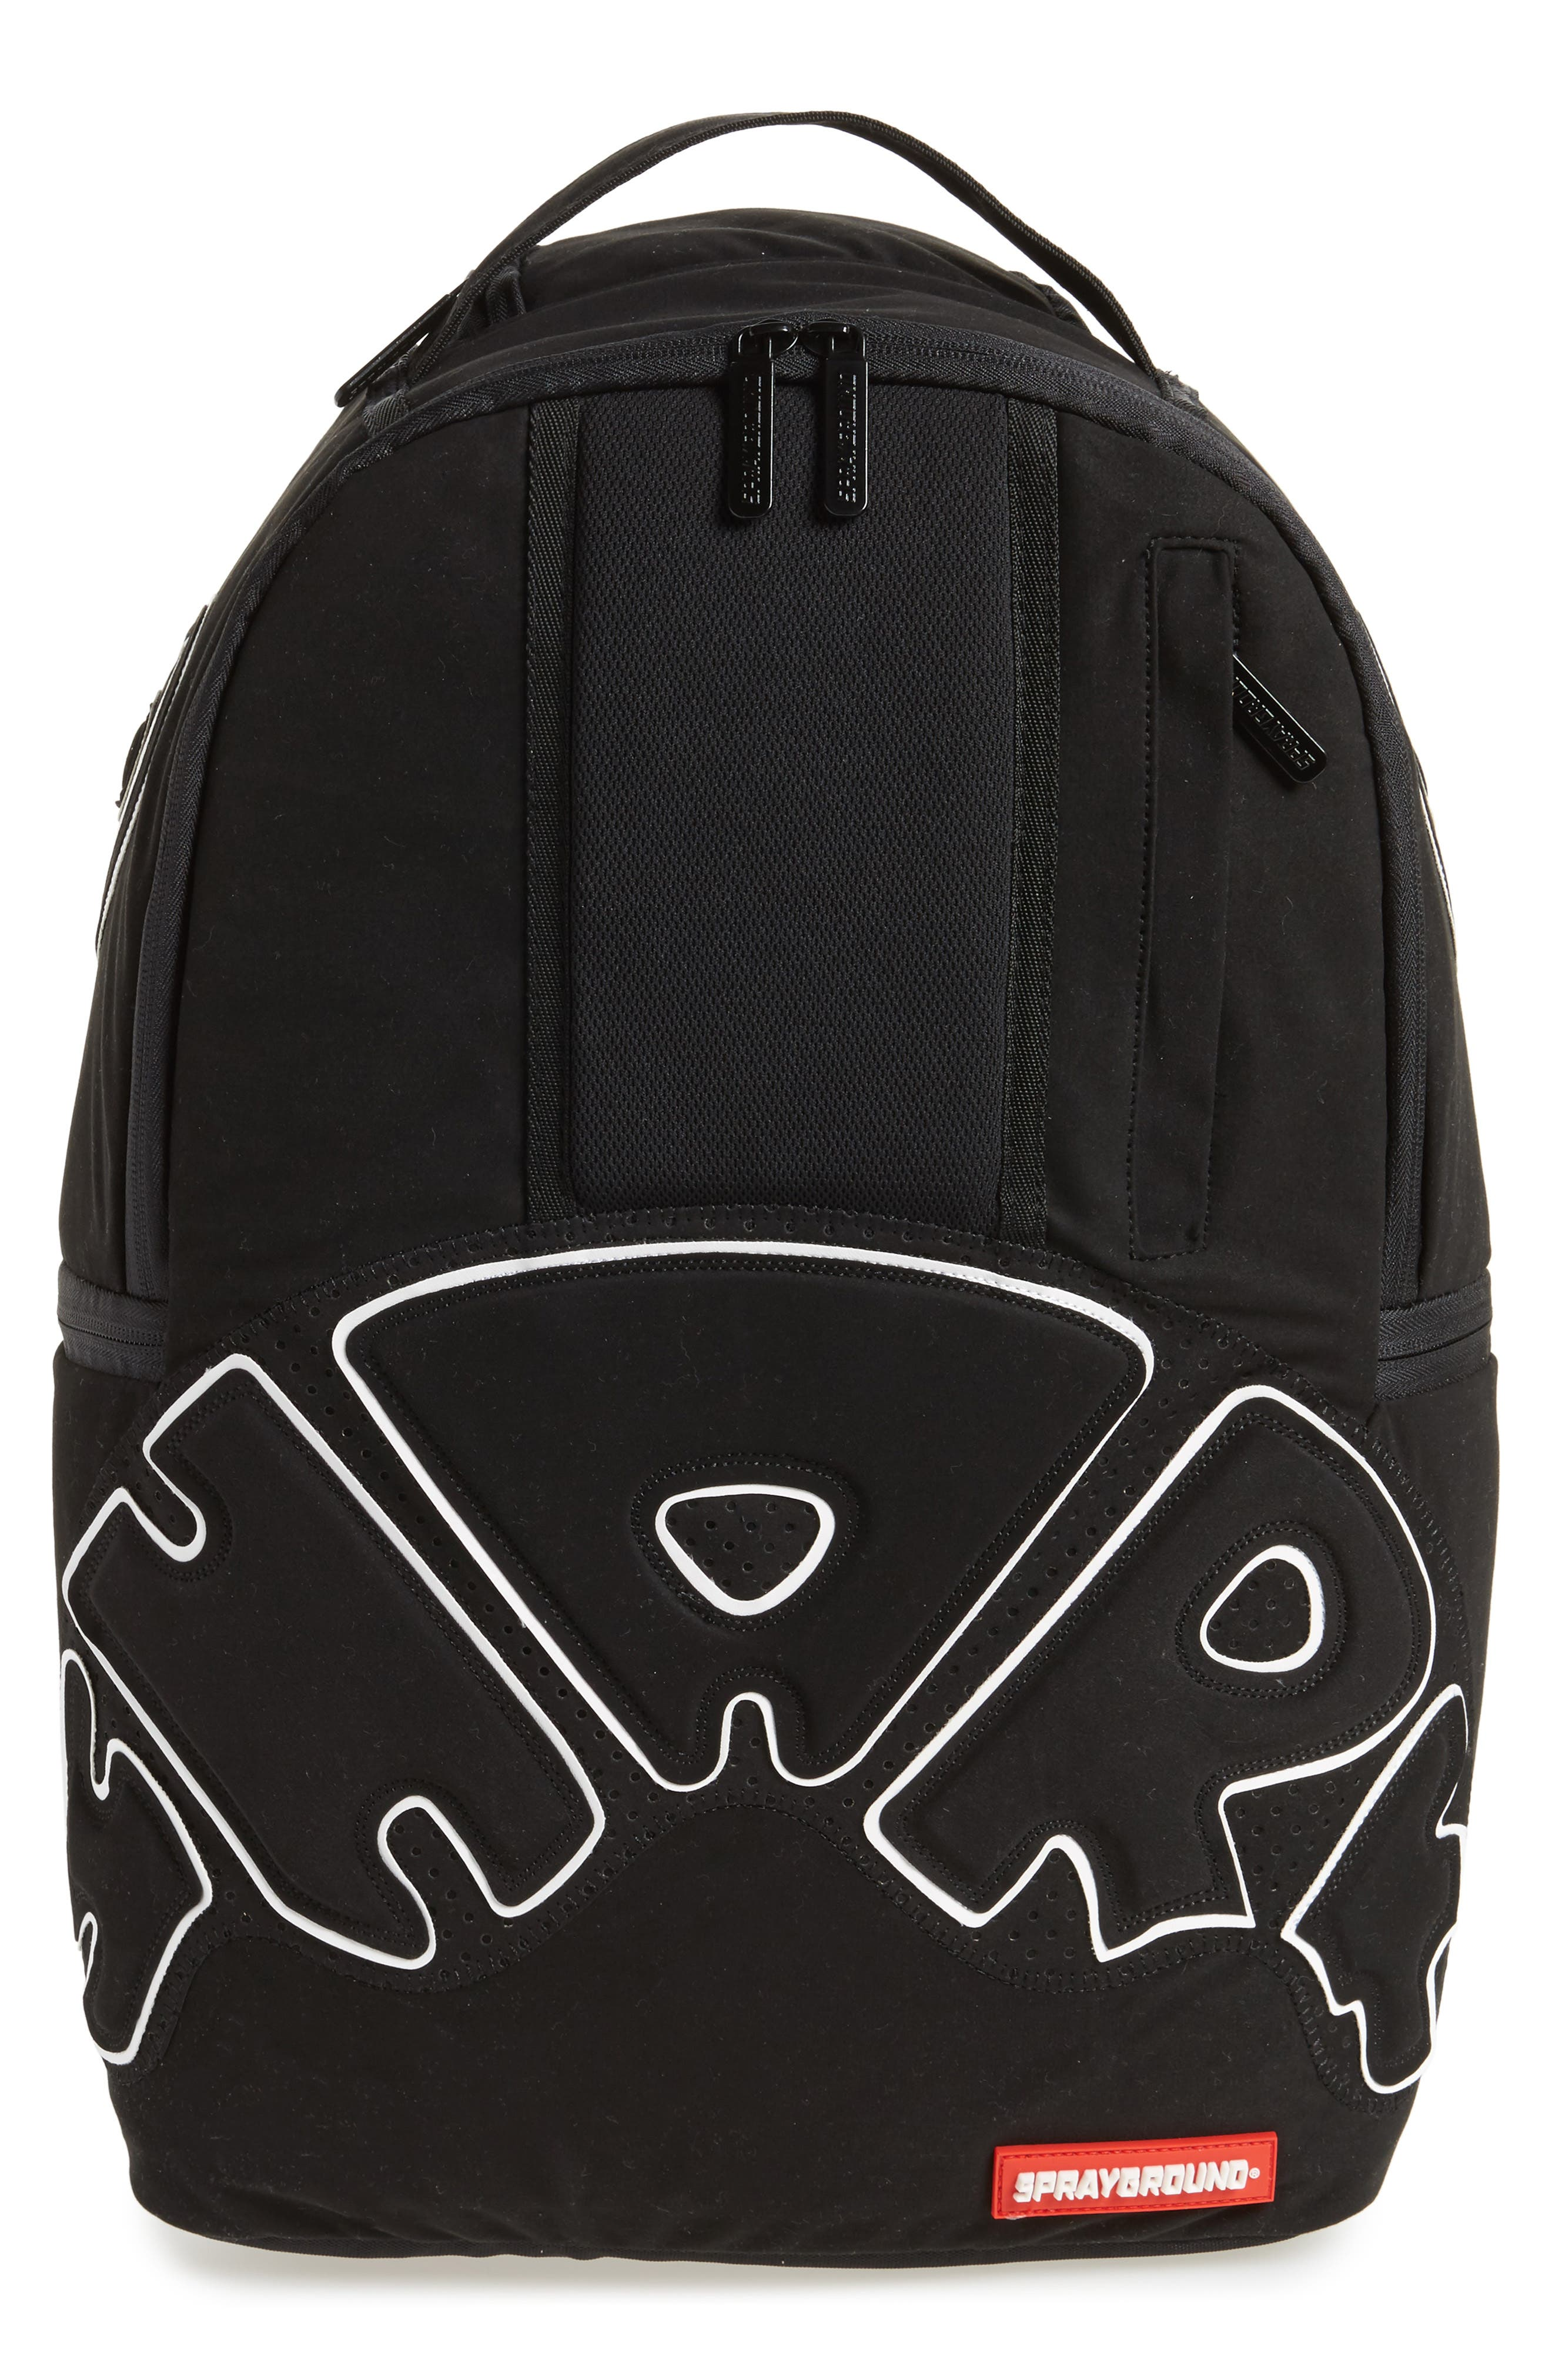 Alternate Image 1 Selected - Sprayground Uptempo Shark Backpack